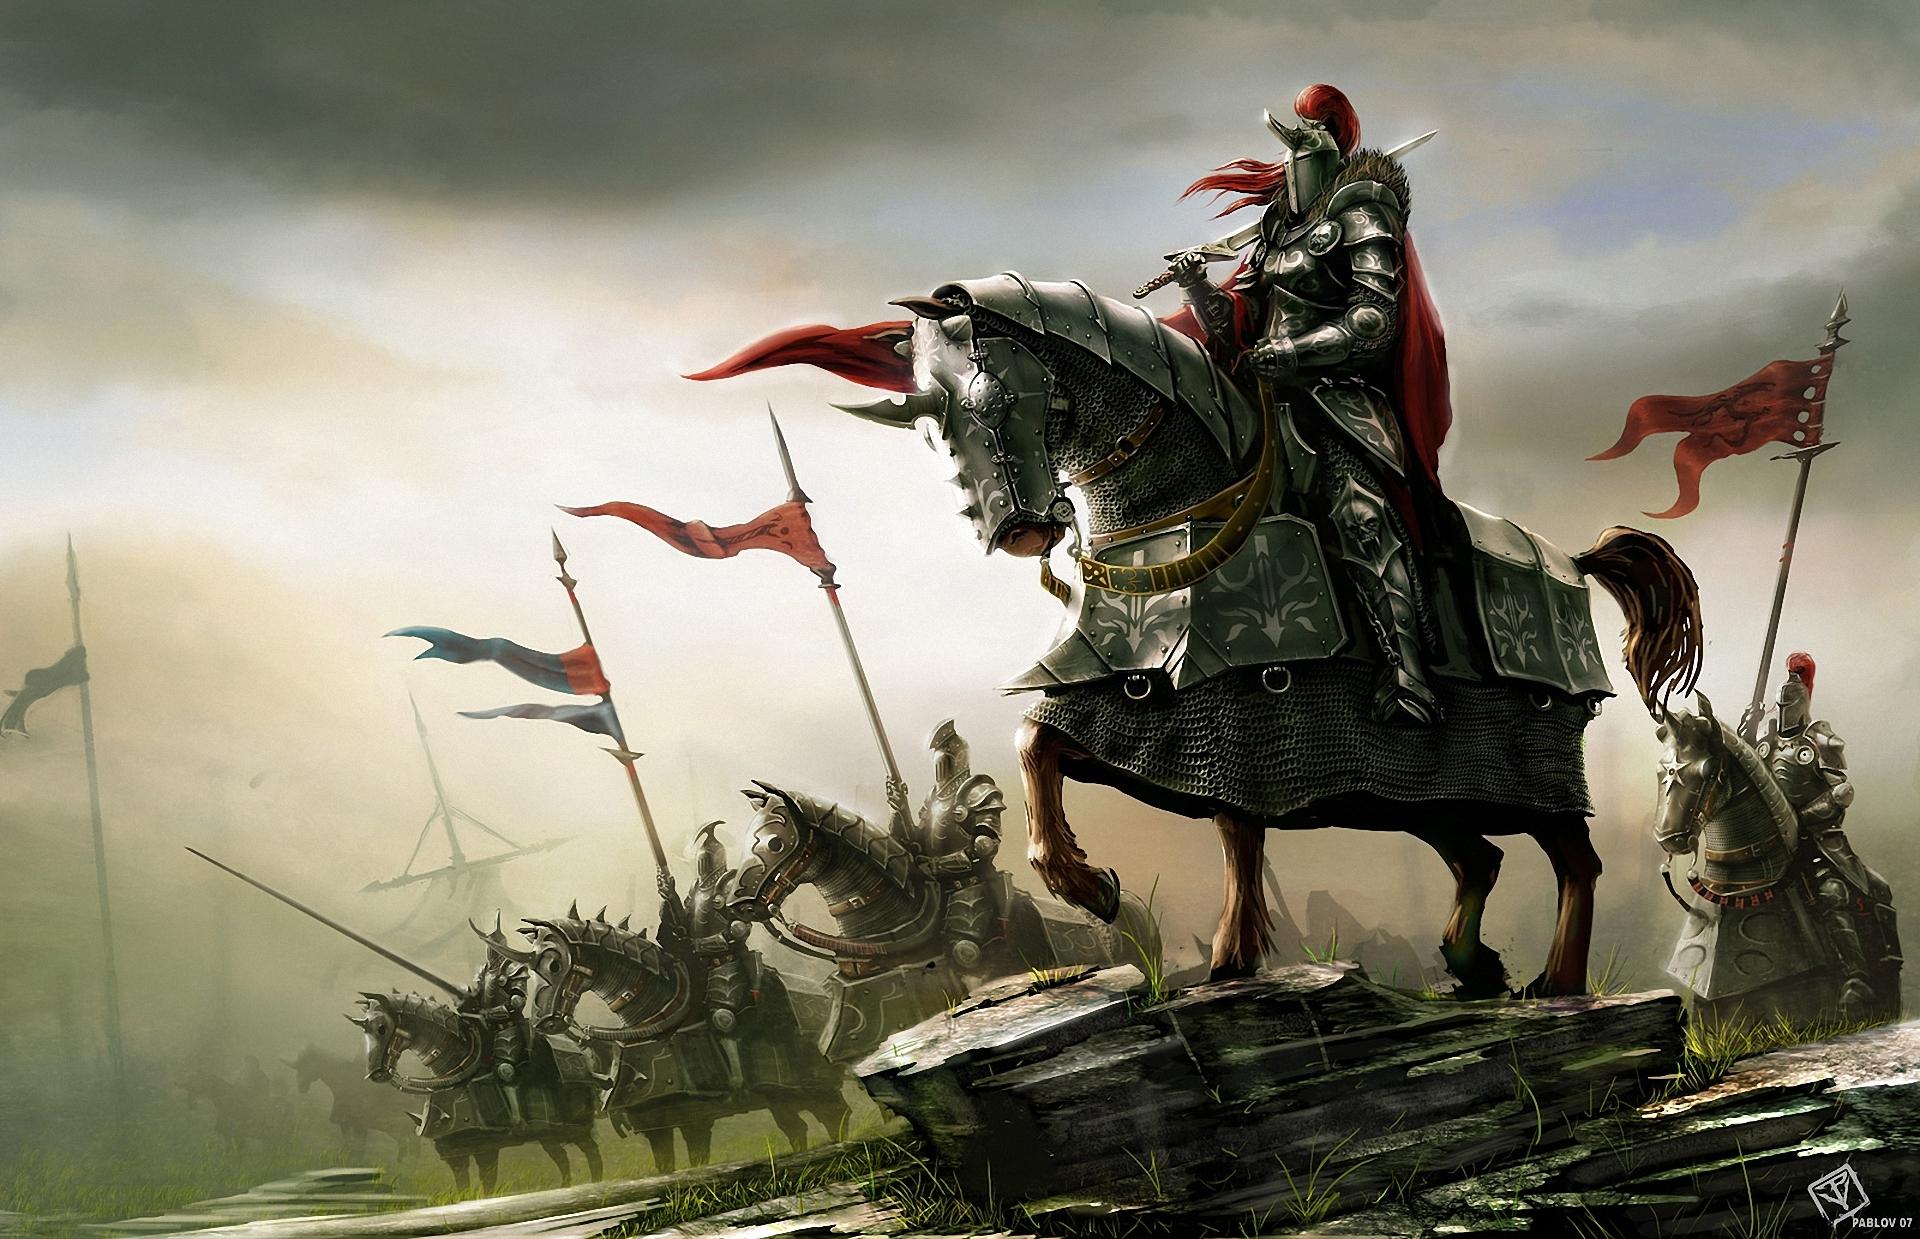 Knight On Horse Wallpaper